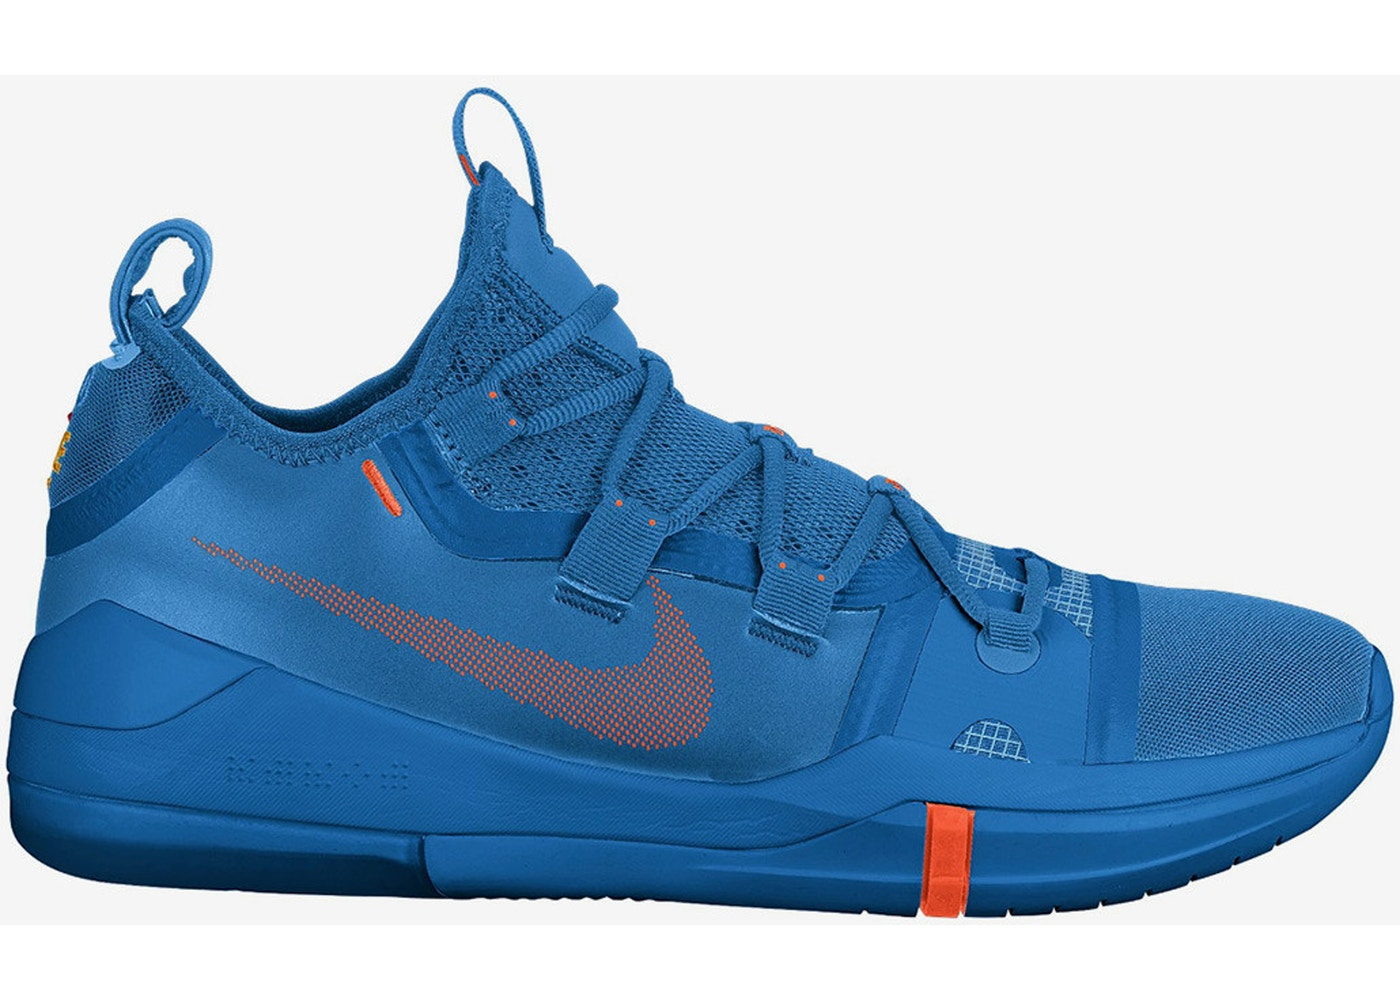 best authentic a3853 b3001 Nike Kobe Shoes - New Highest Bids